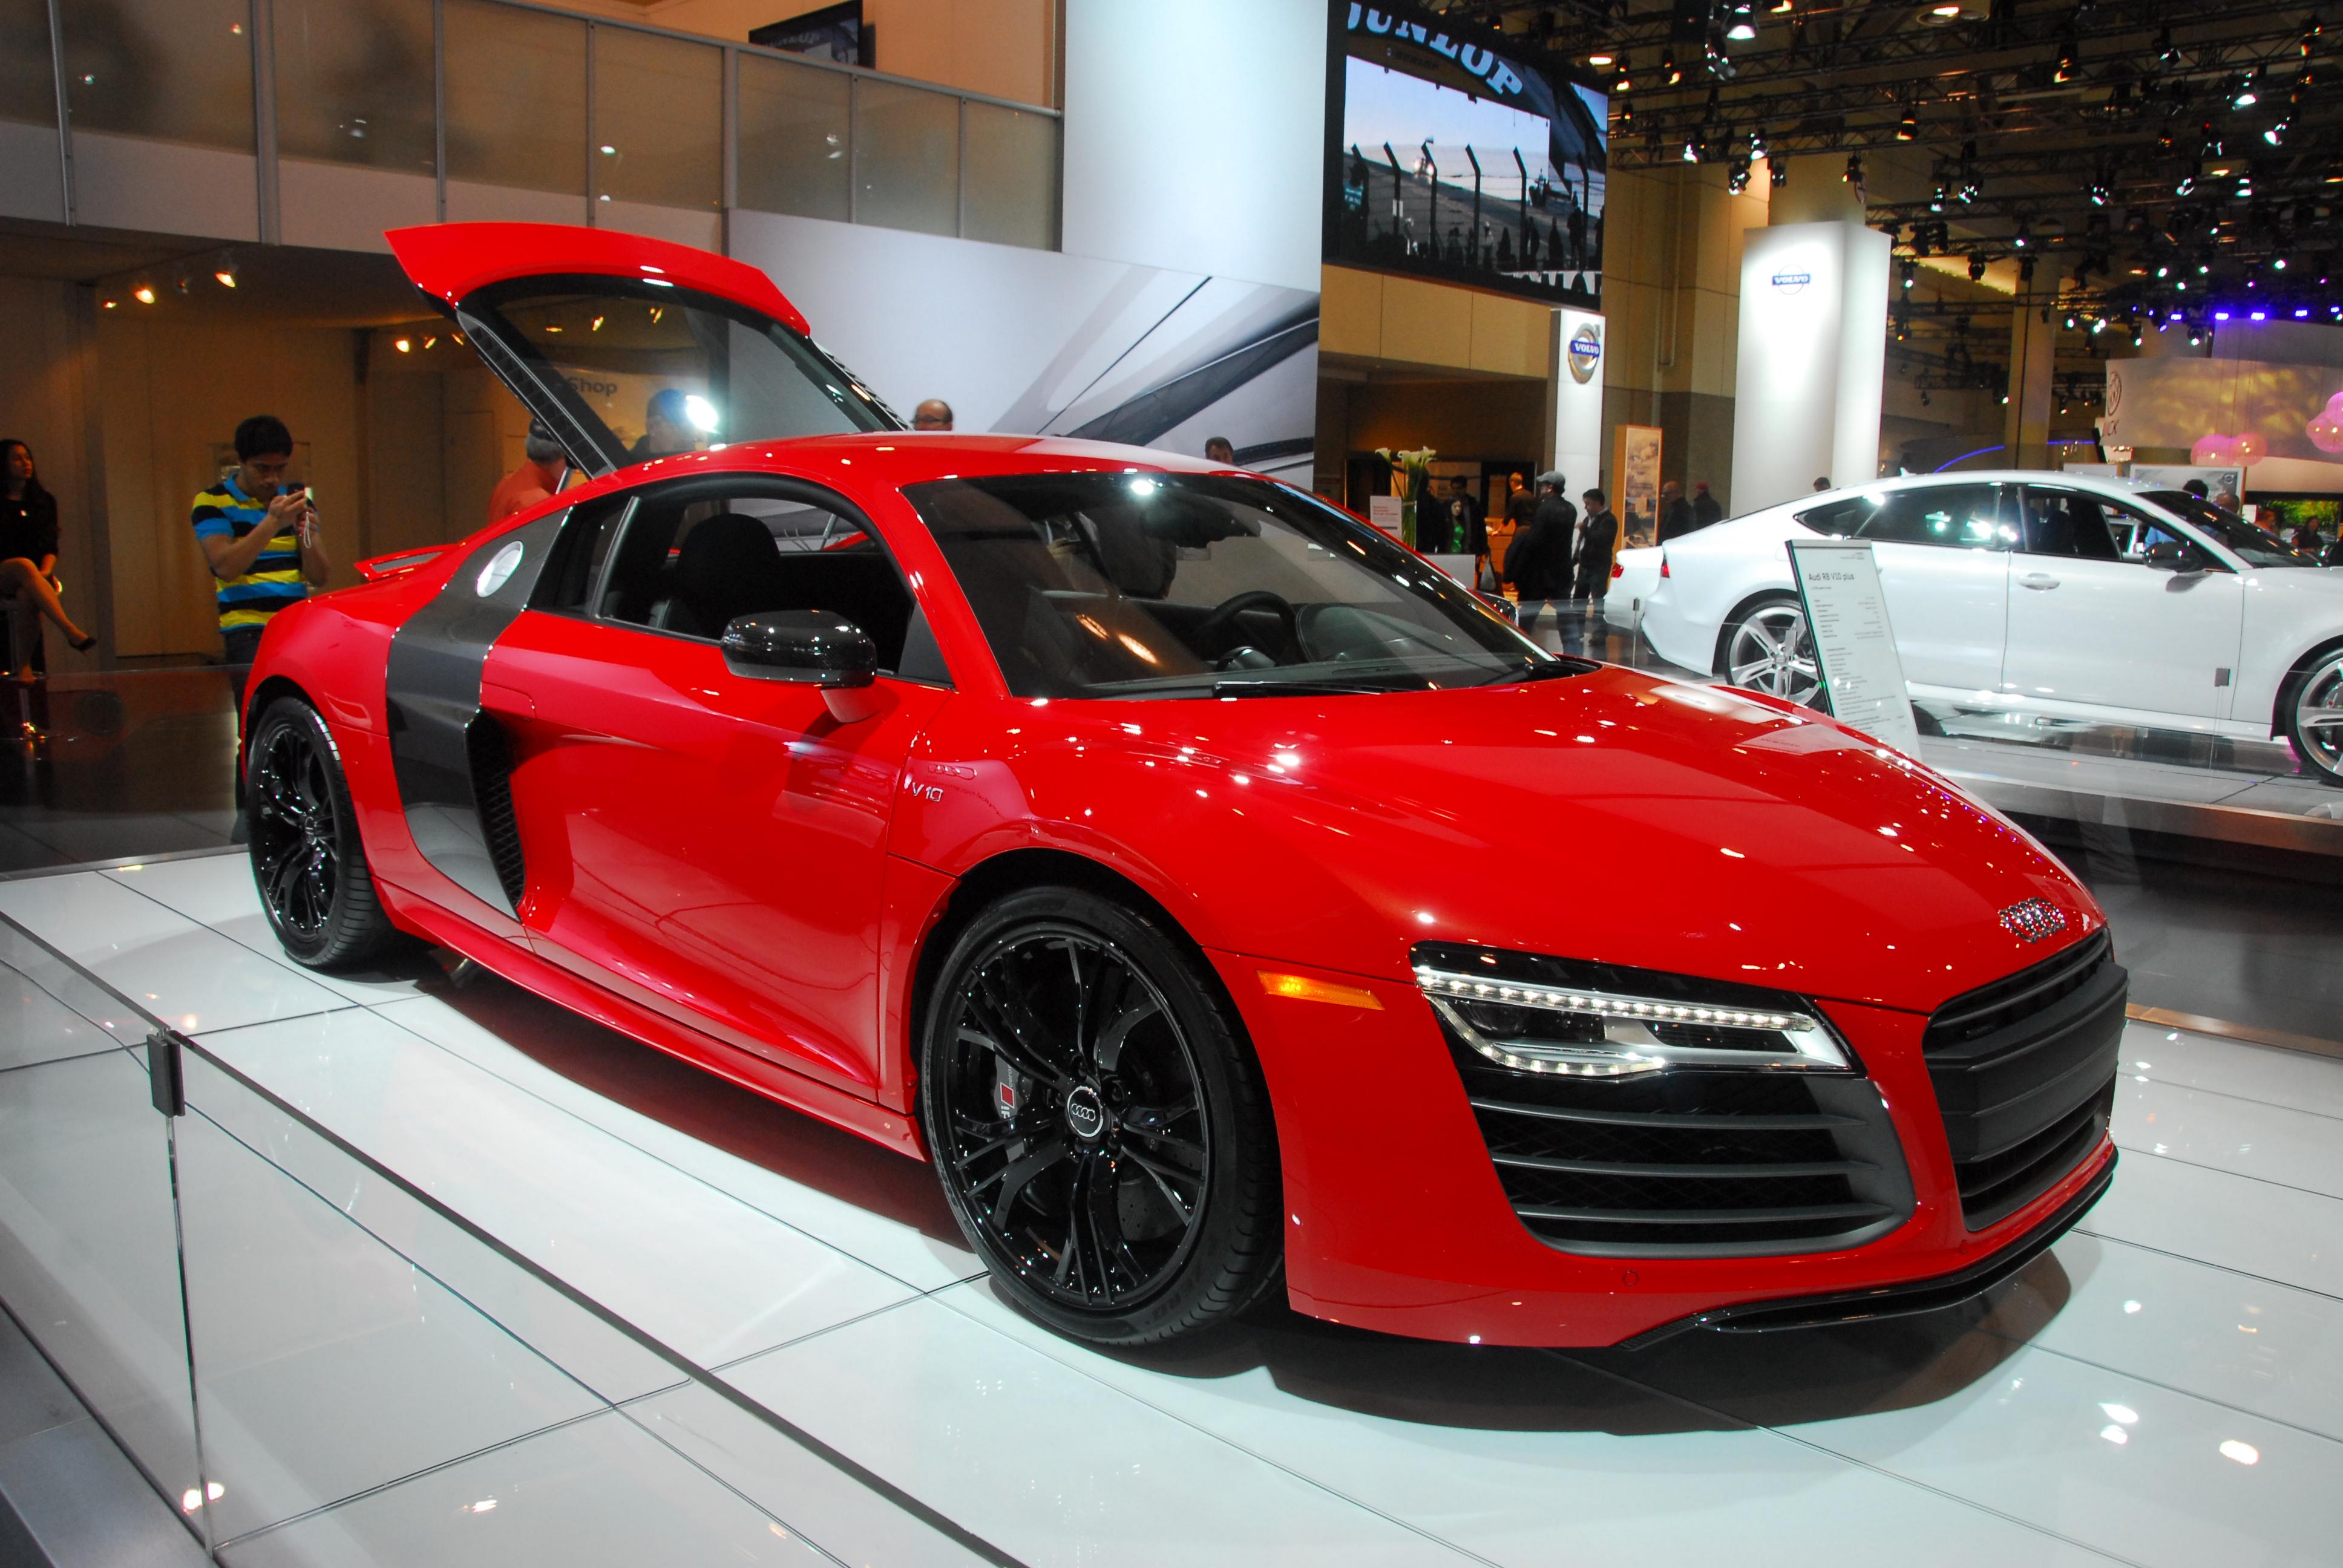 File:Audi R8 V10 Plus (8505431830).jpg - Wikimedia Commons